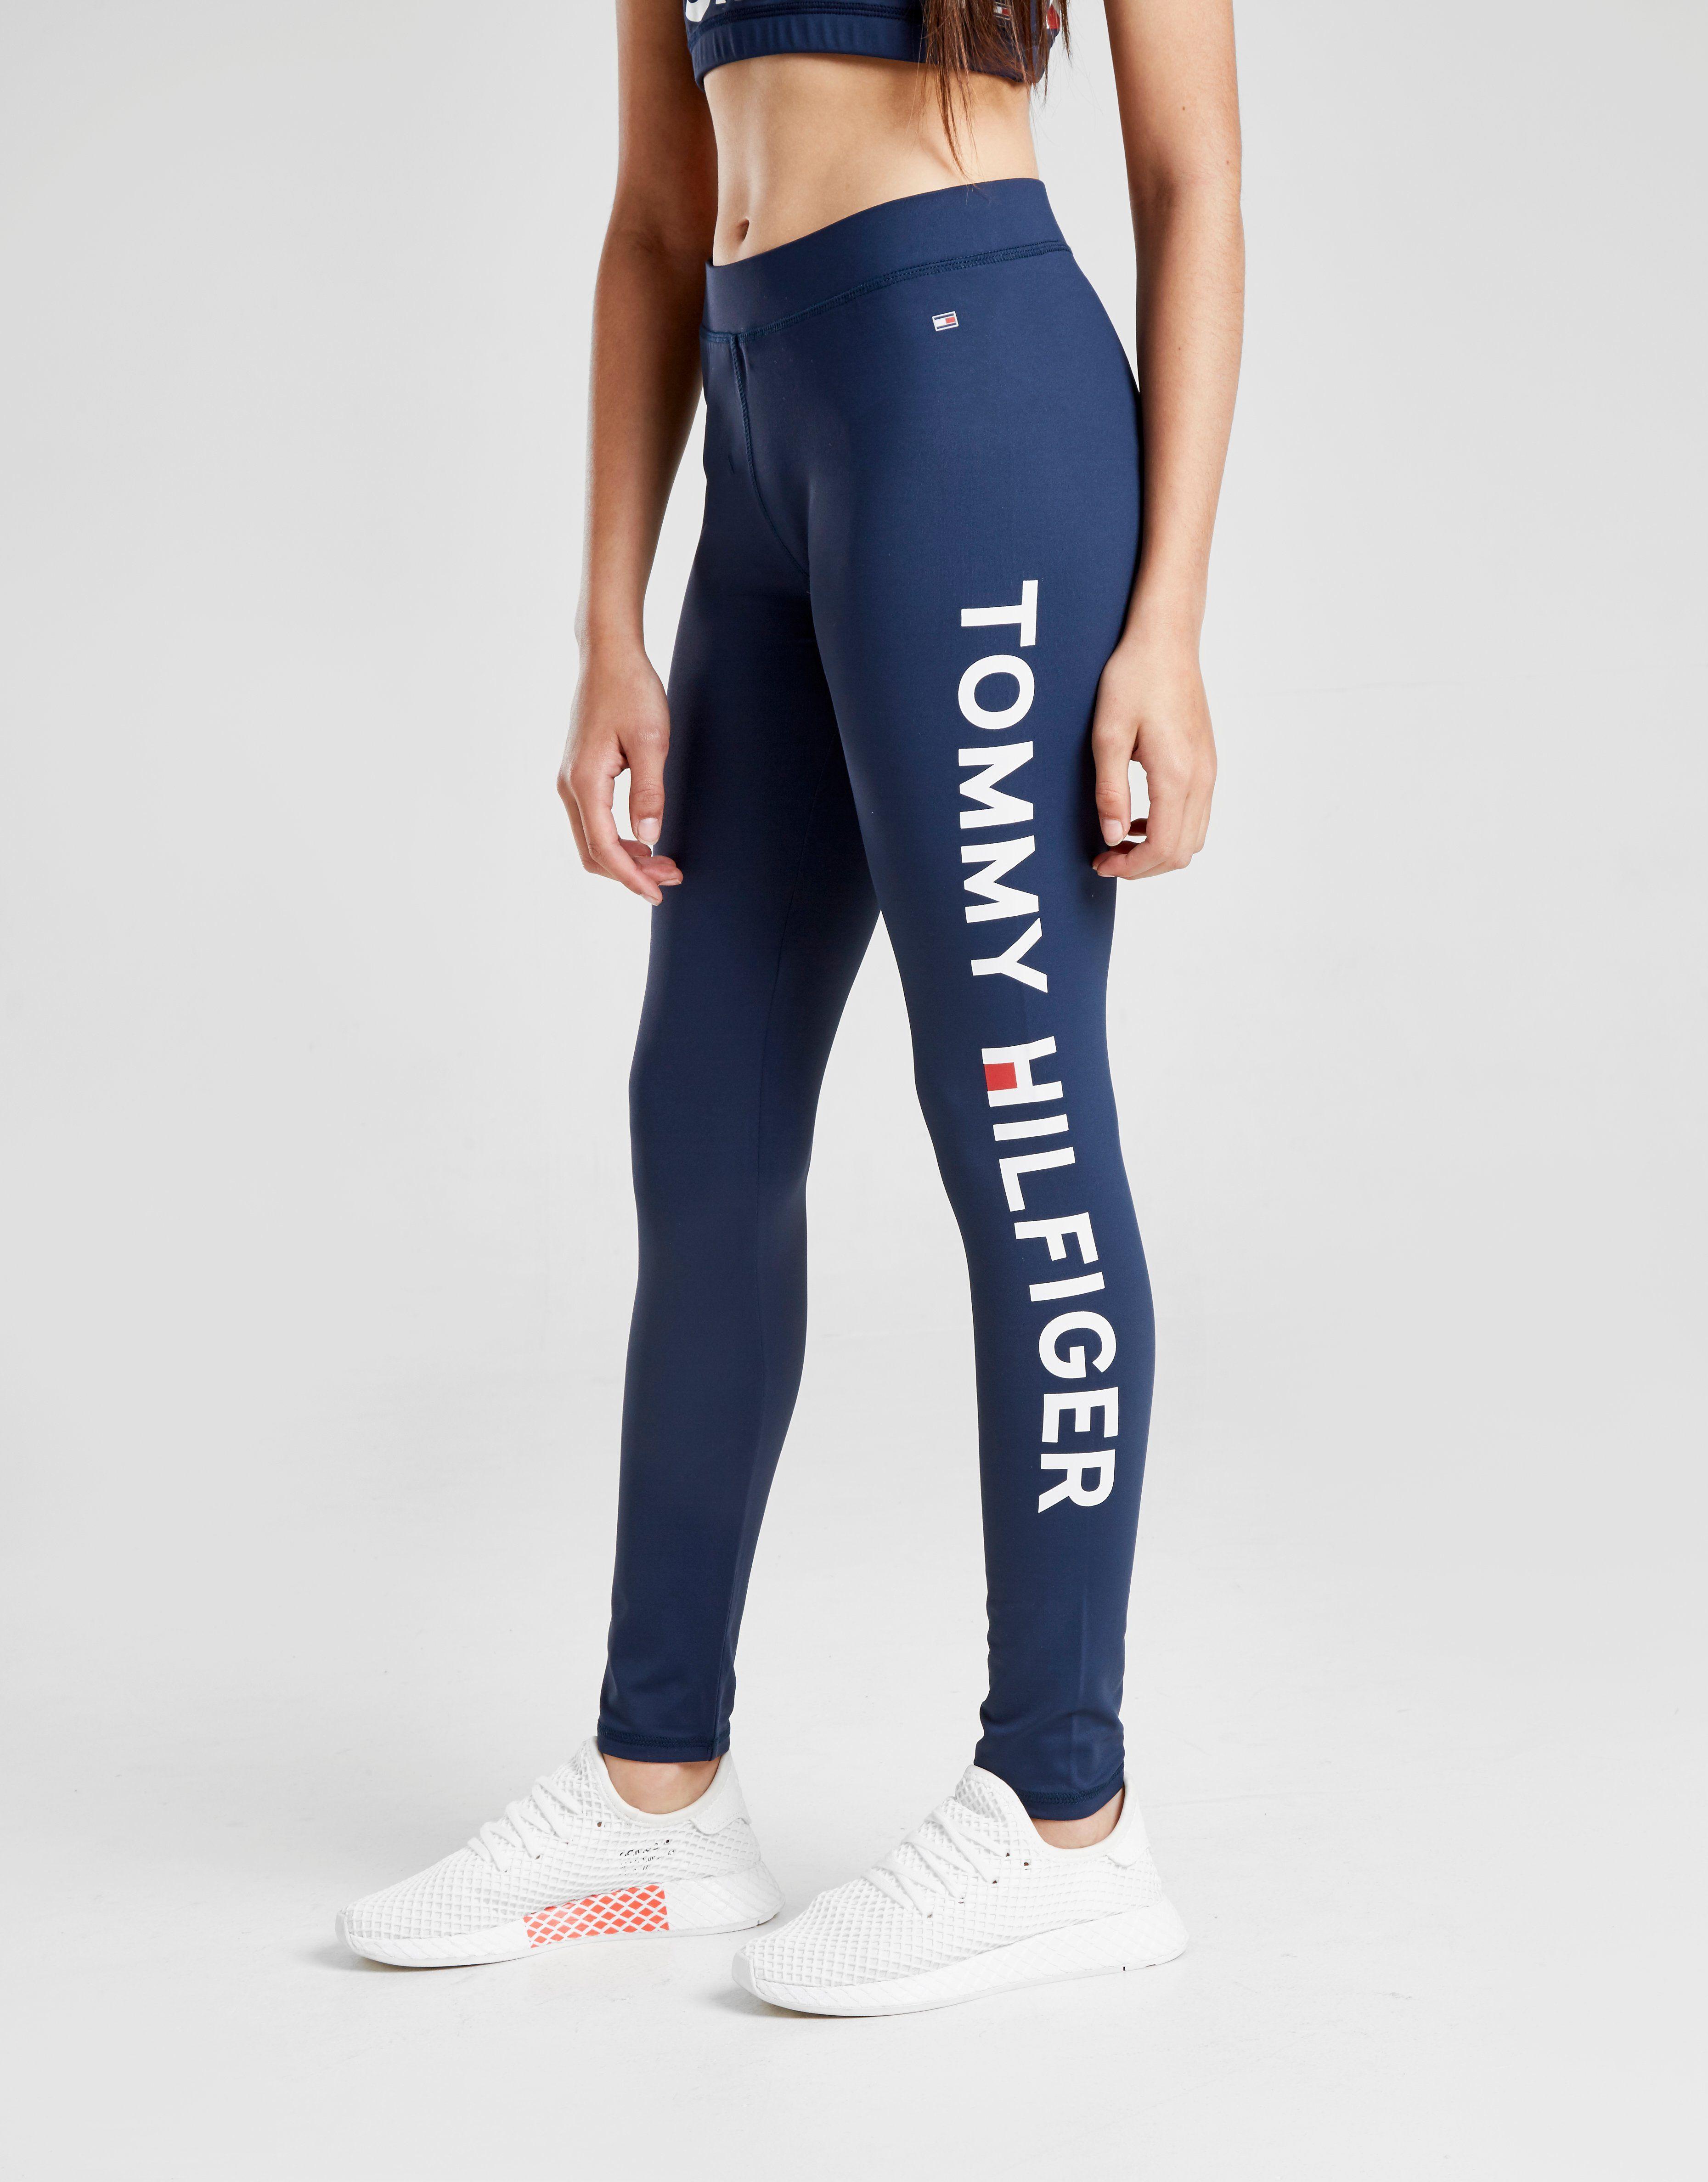 tommy-hilfiger-girls-sport-logo-tights-junior by tommy-hilfiger